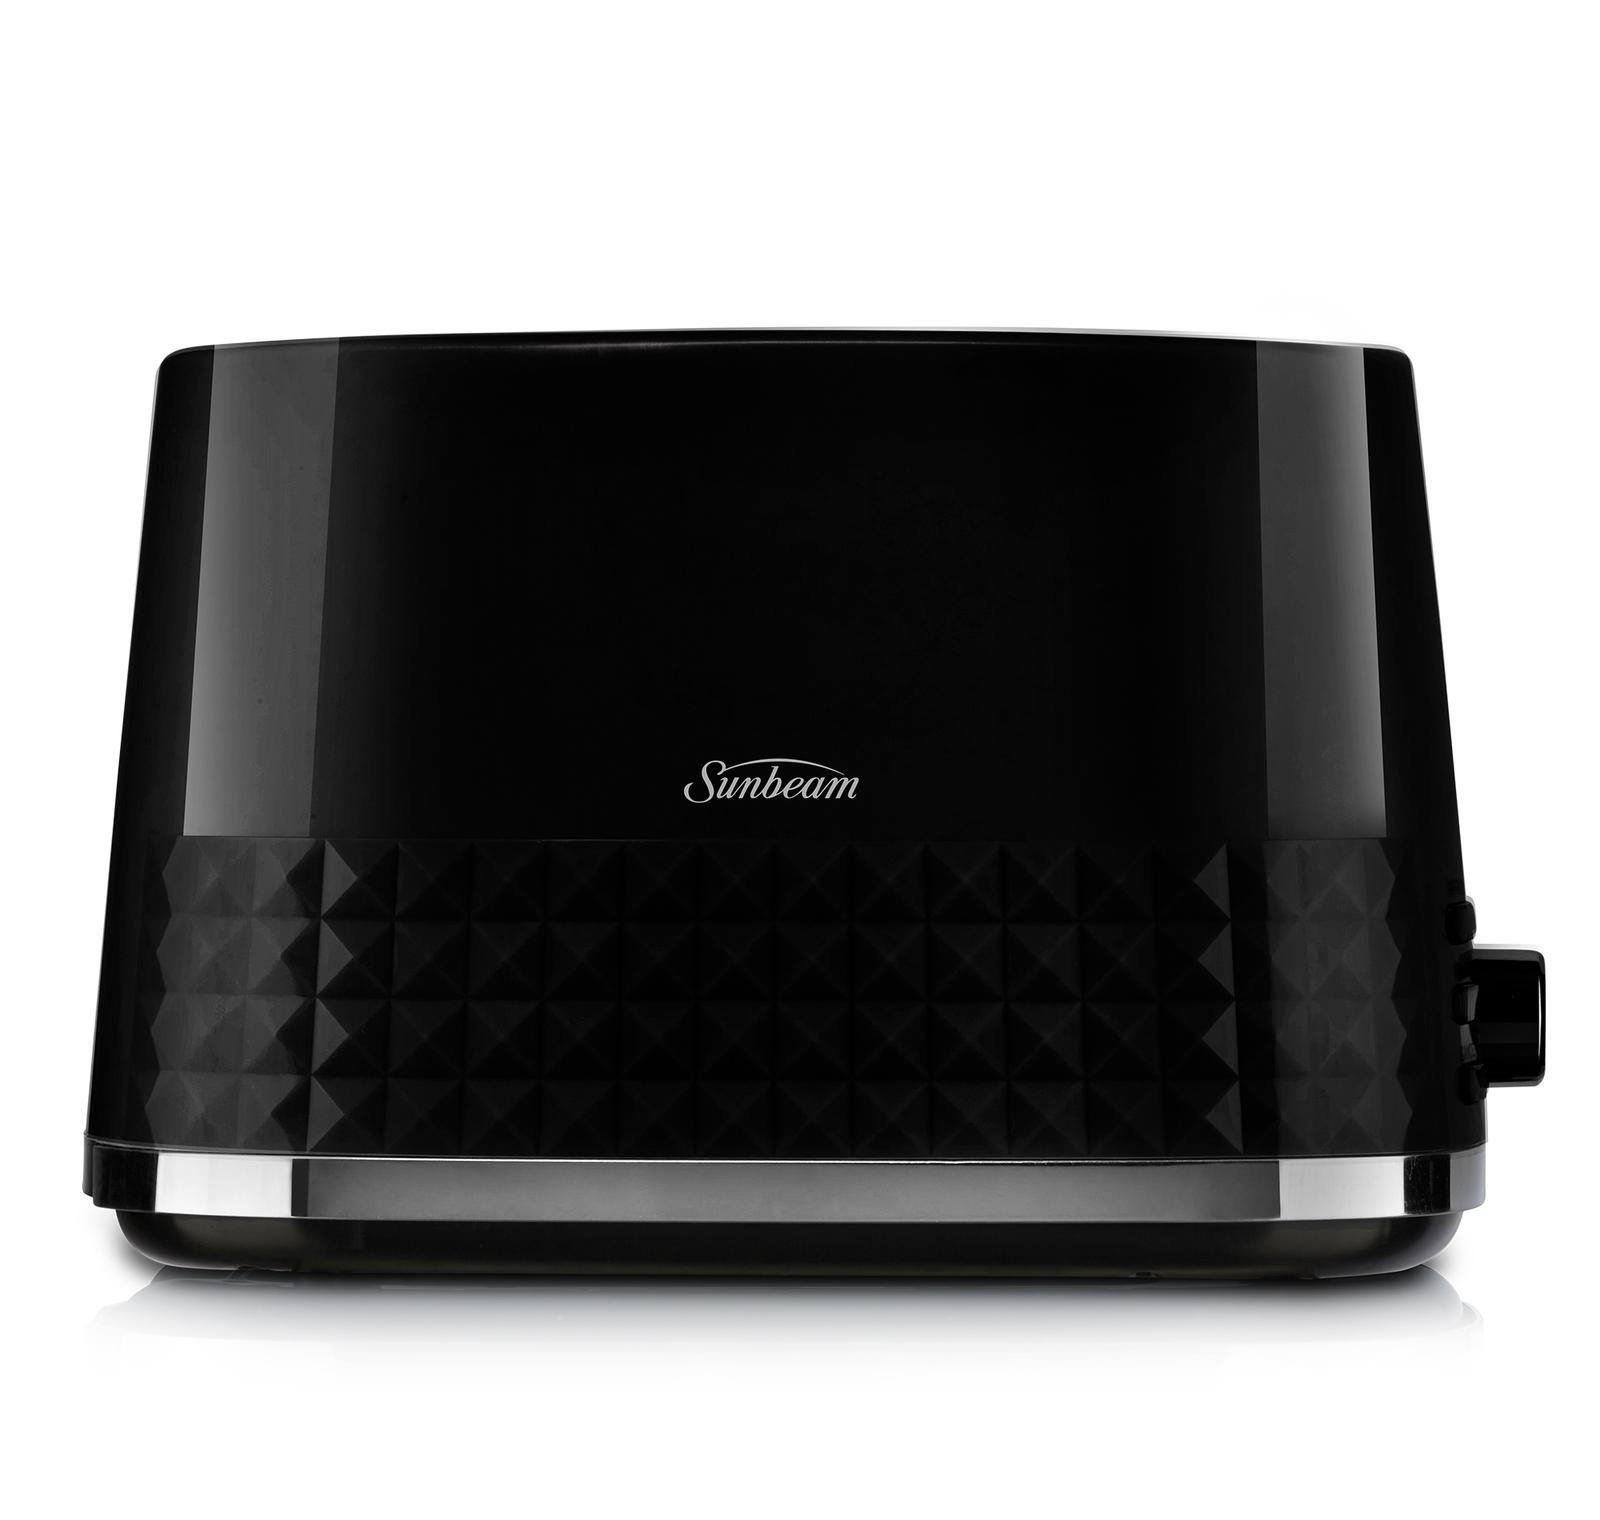 Sunbeam: Diamond Collection 2 Slice Toaster - Black image